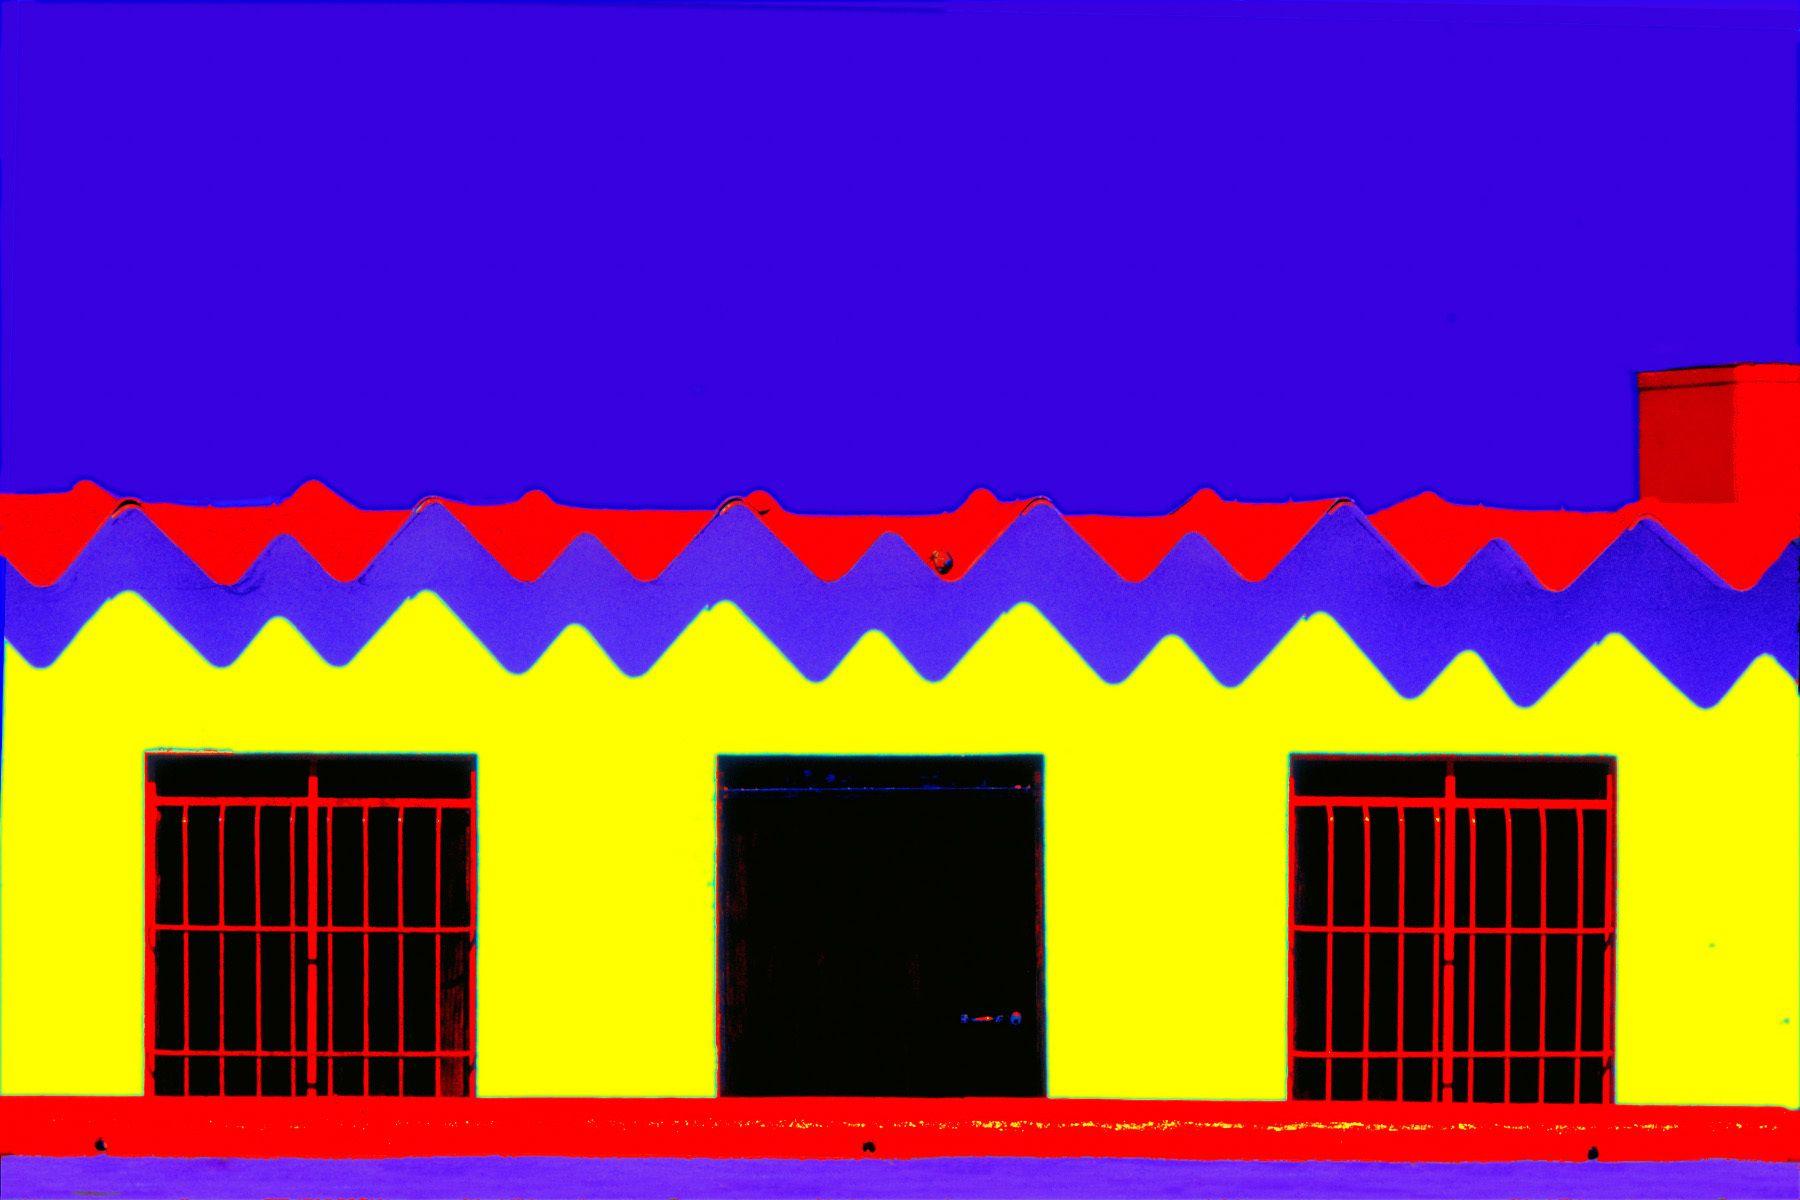 21_0_26_1c_gottlieb_zigzag.jpg